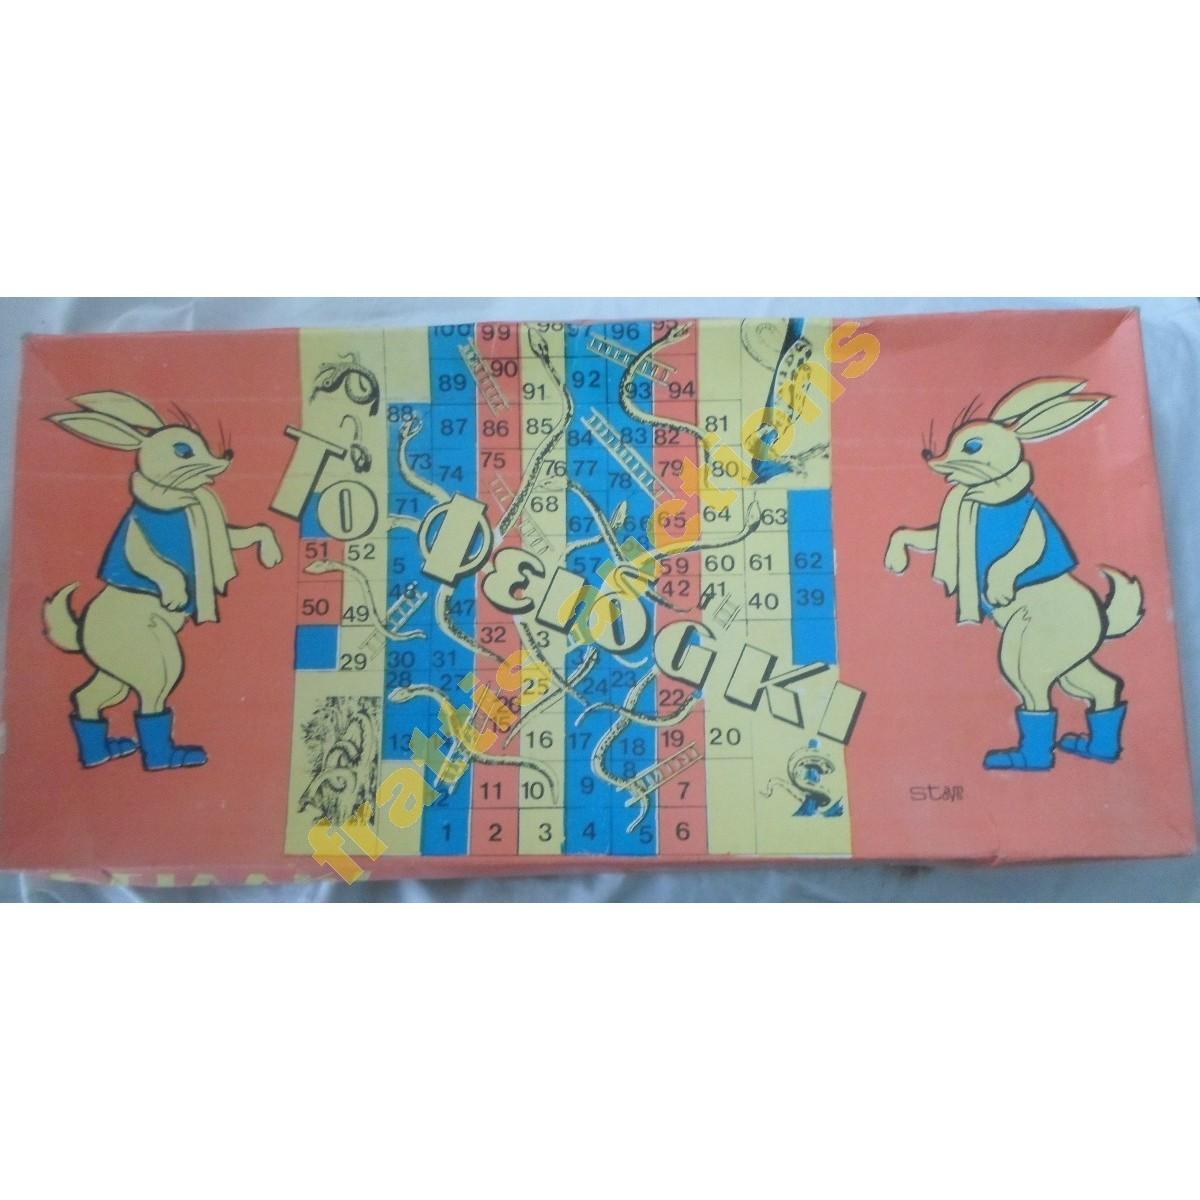 "Vintage Board Game ""Το Φιδάκι"" made in Greece από το STAM TOYS."